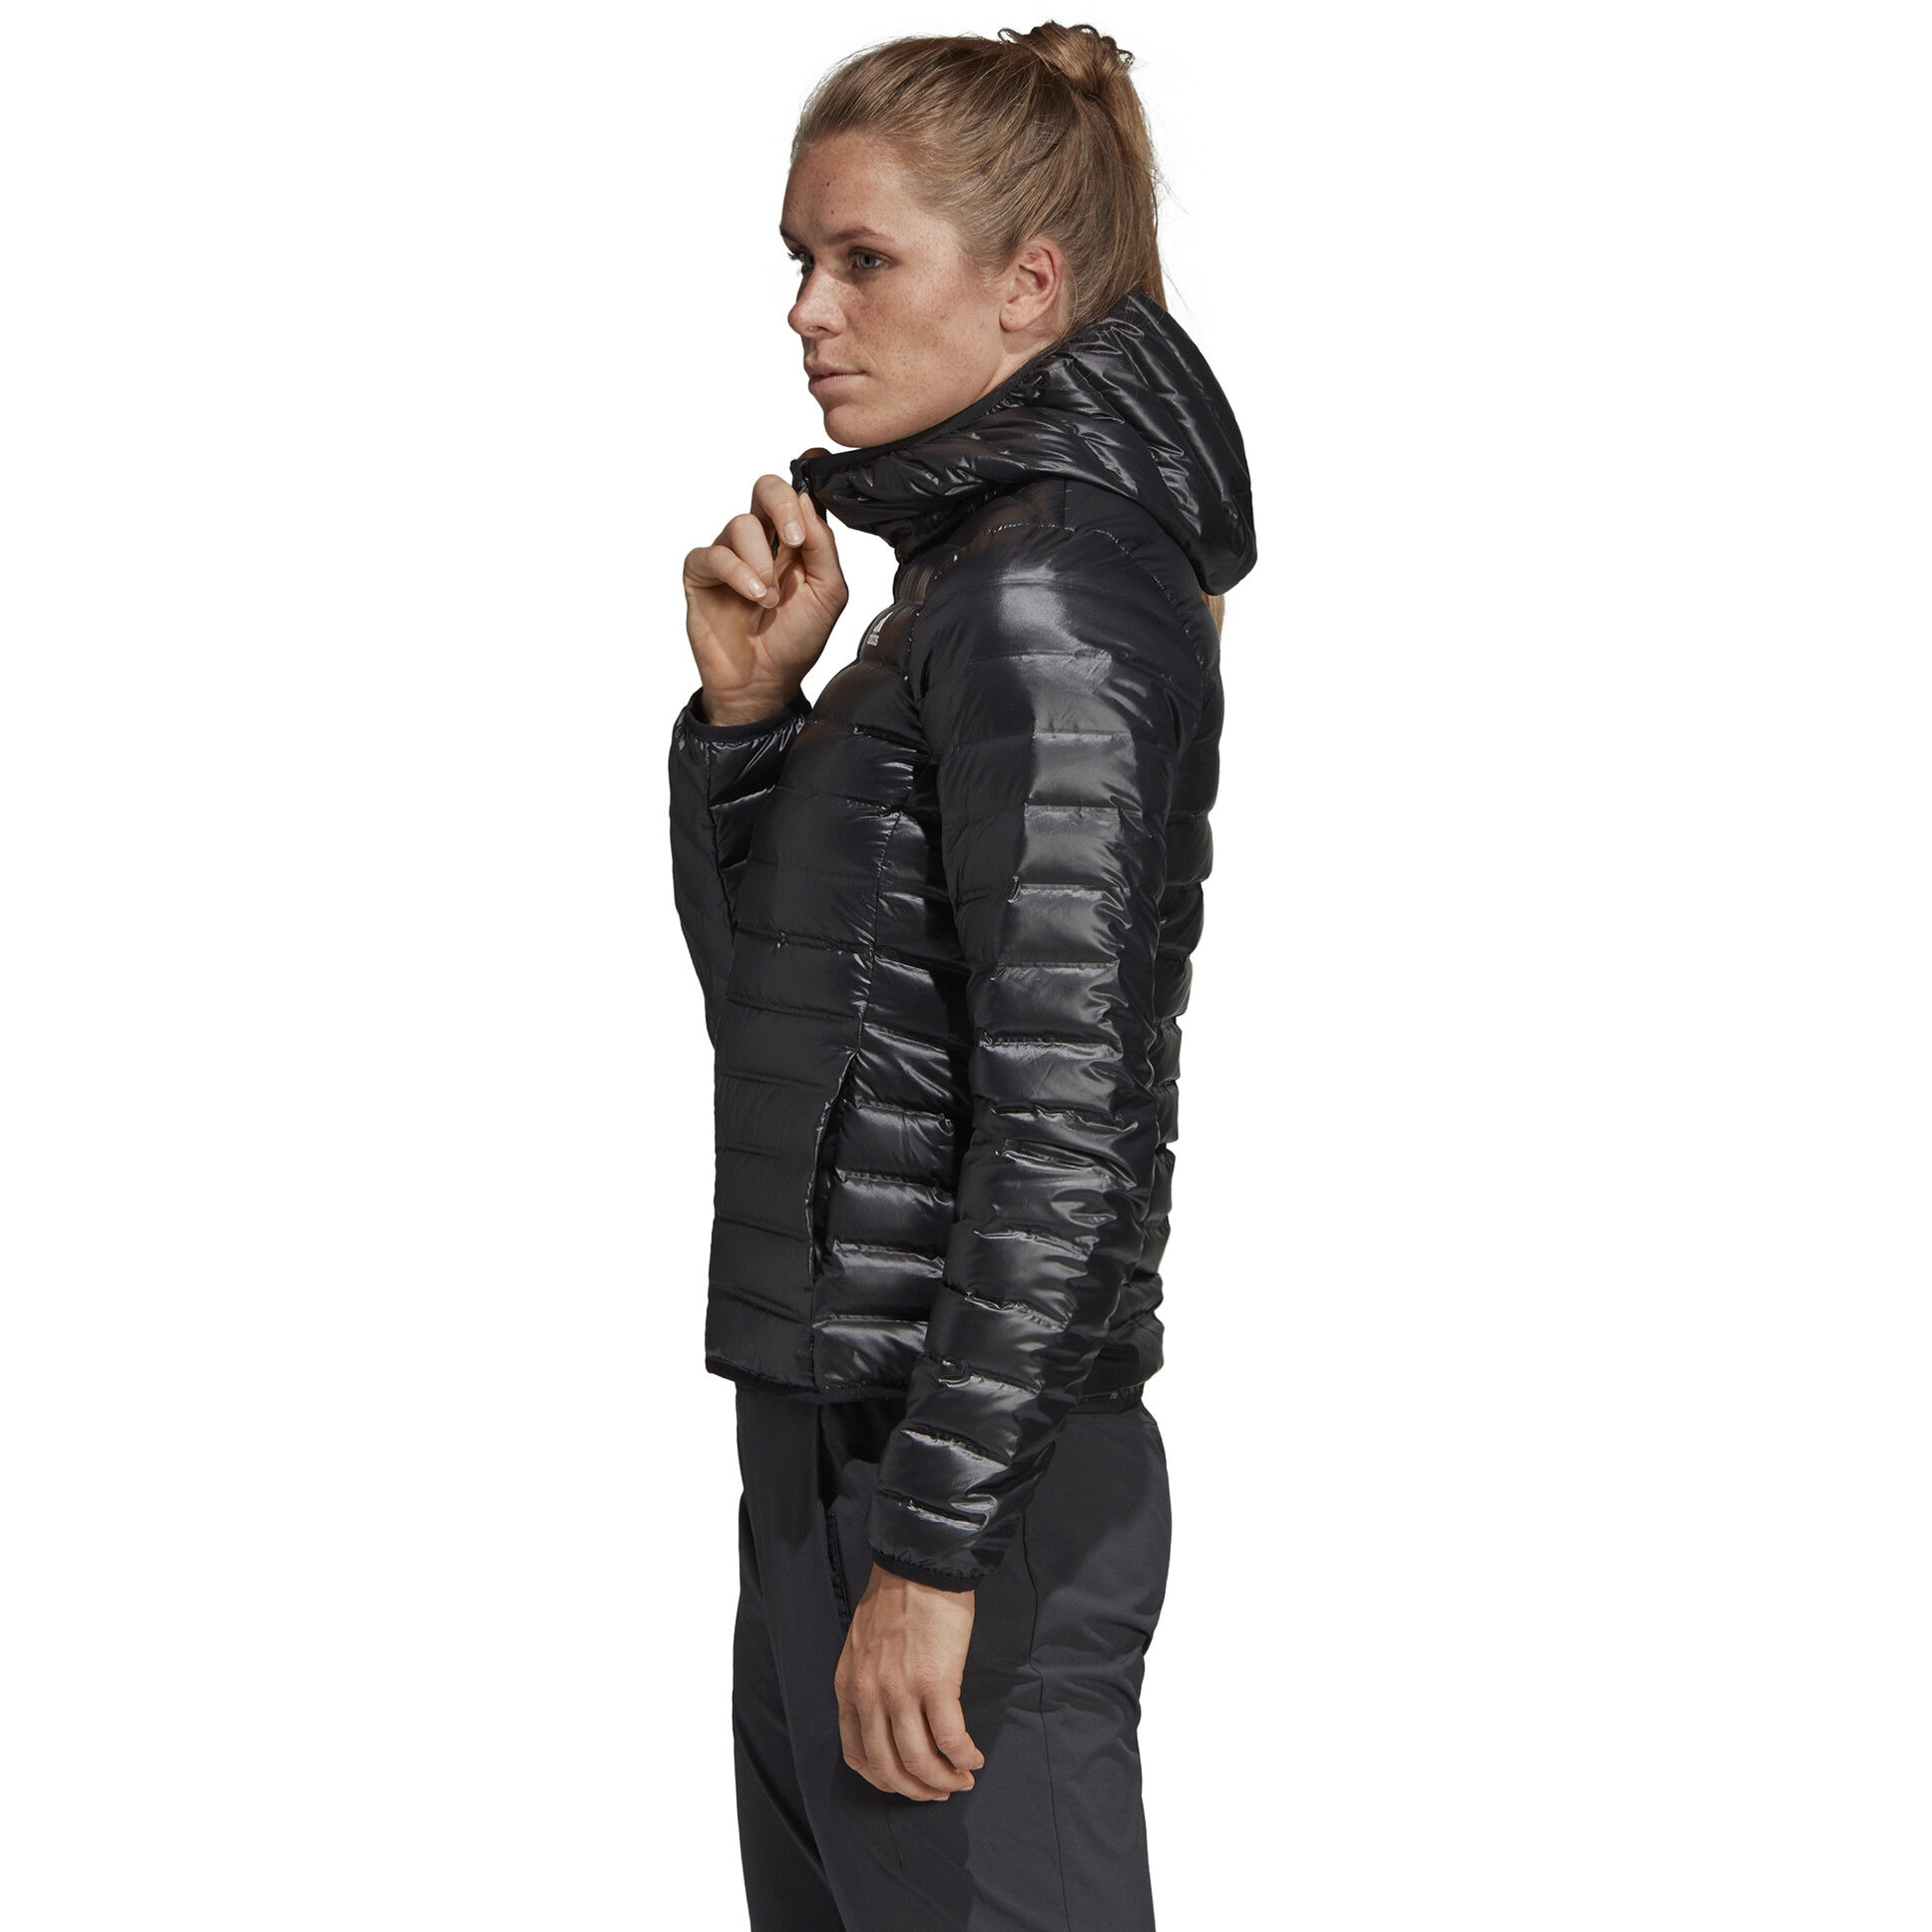 Damen Terrex Daunenjacke Kapuzen Black Varilite Adidas WHe9bEIYD2